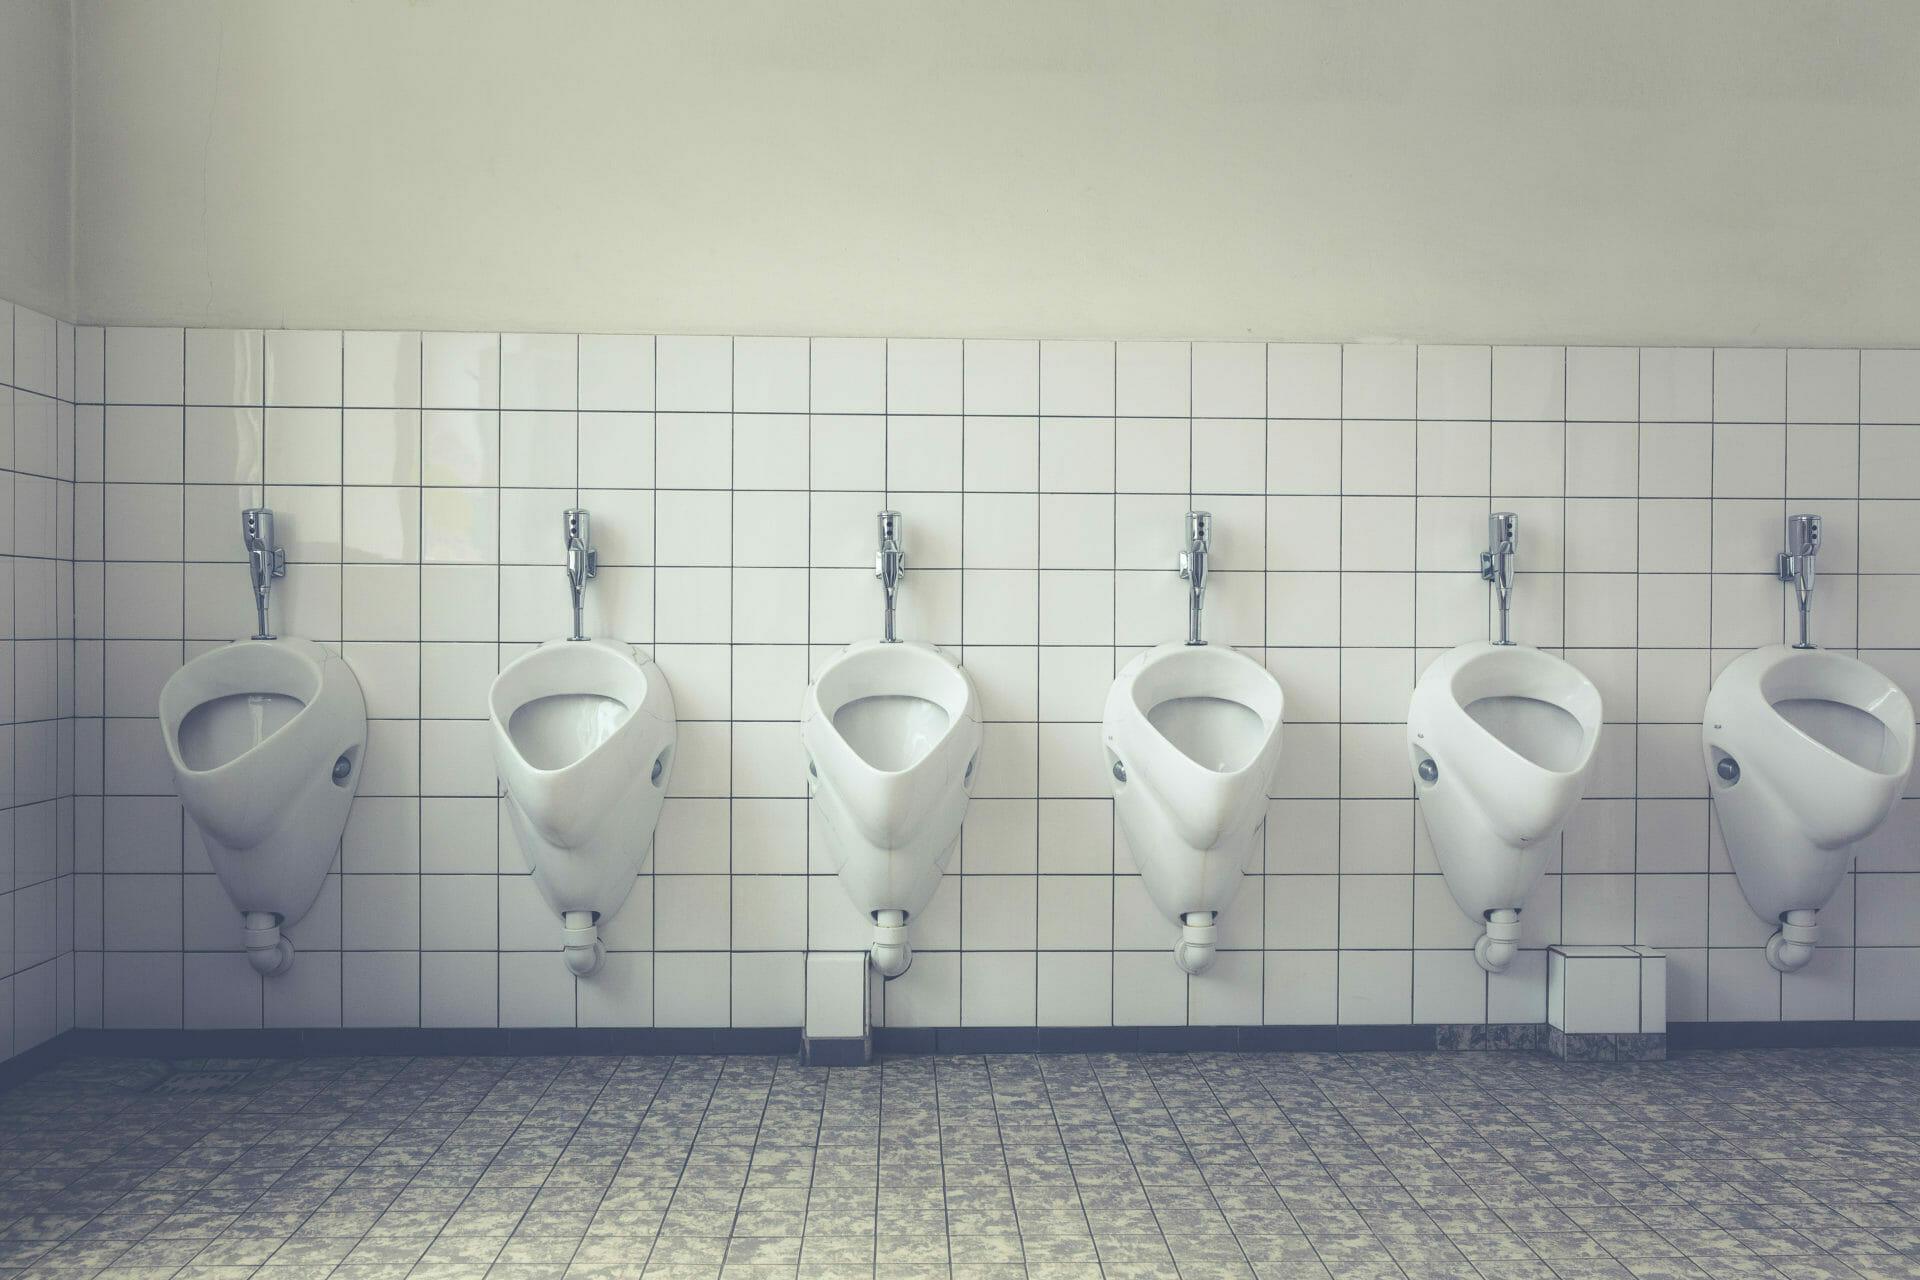 blood-in-urine